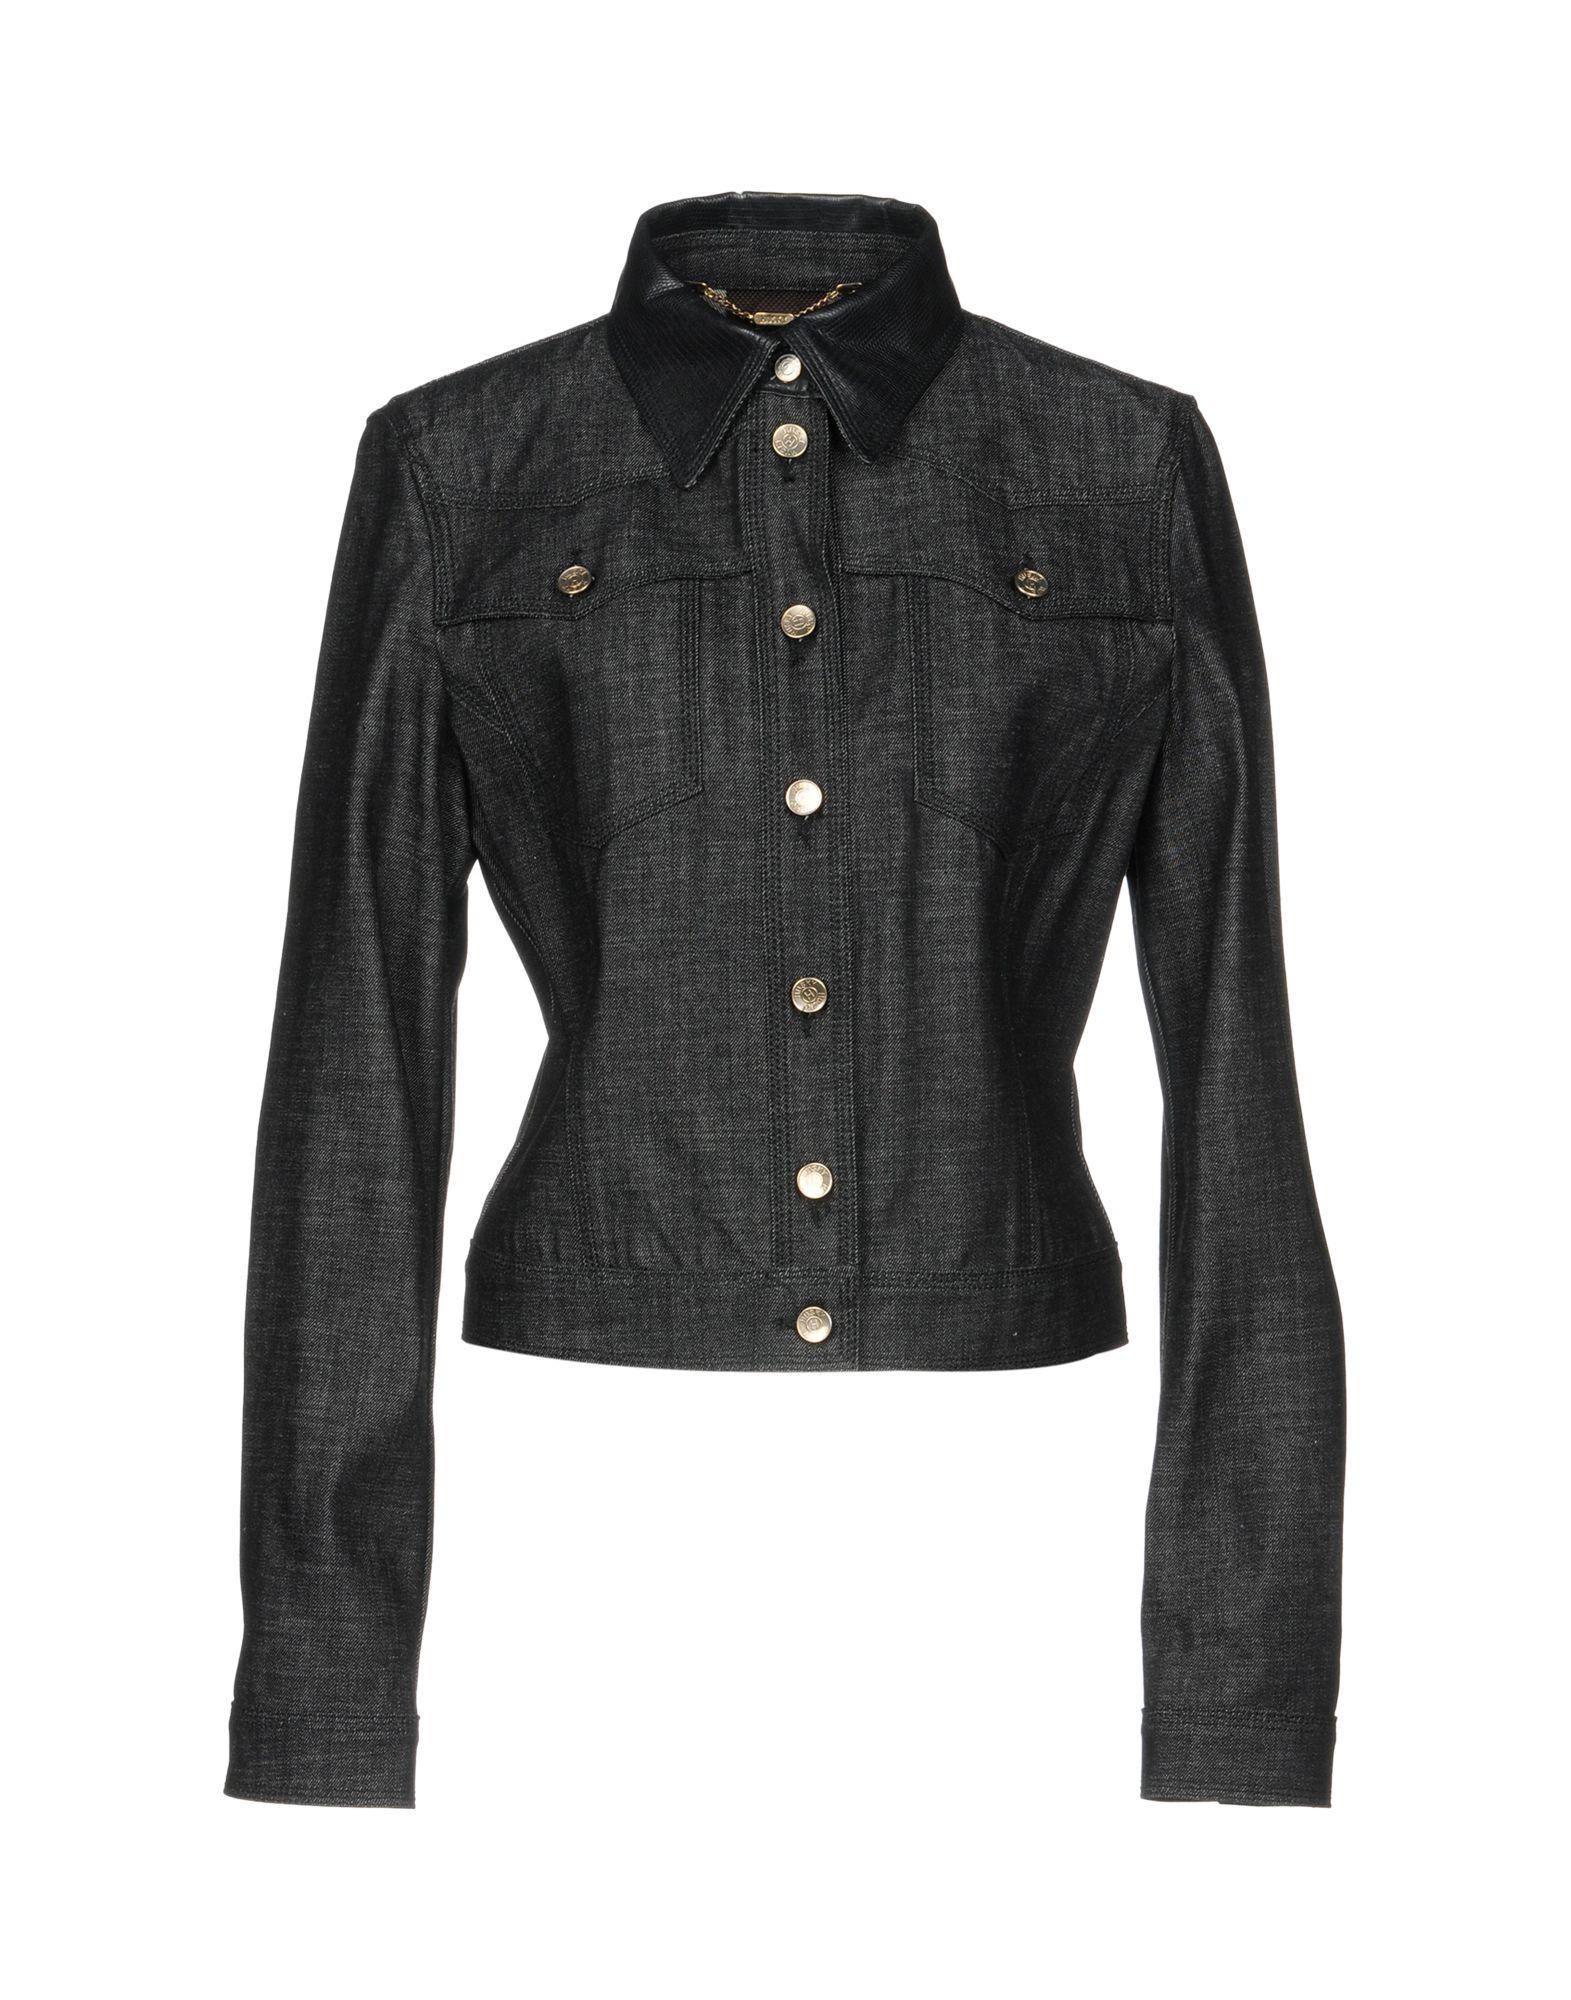 Giubbotto Jeans Husky Donna - Acquista online su FIXabRQFep